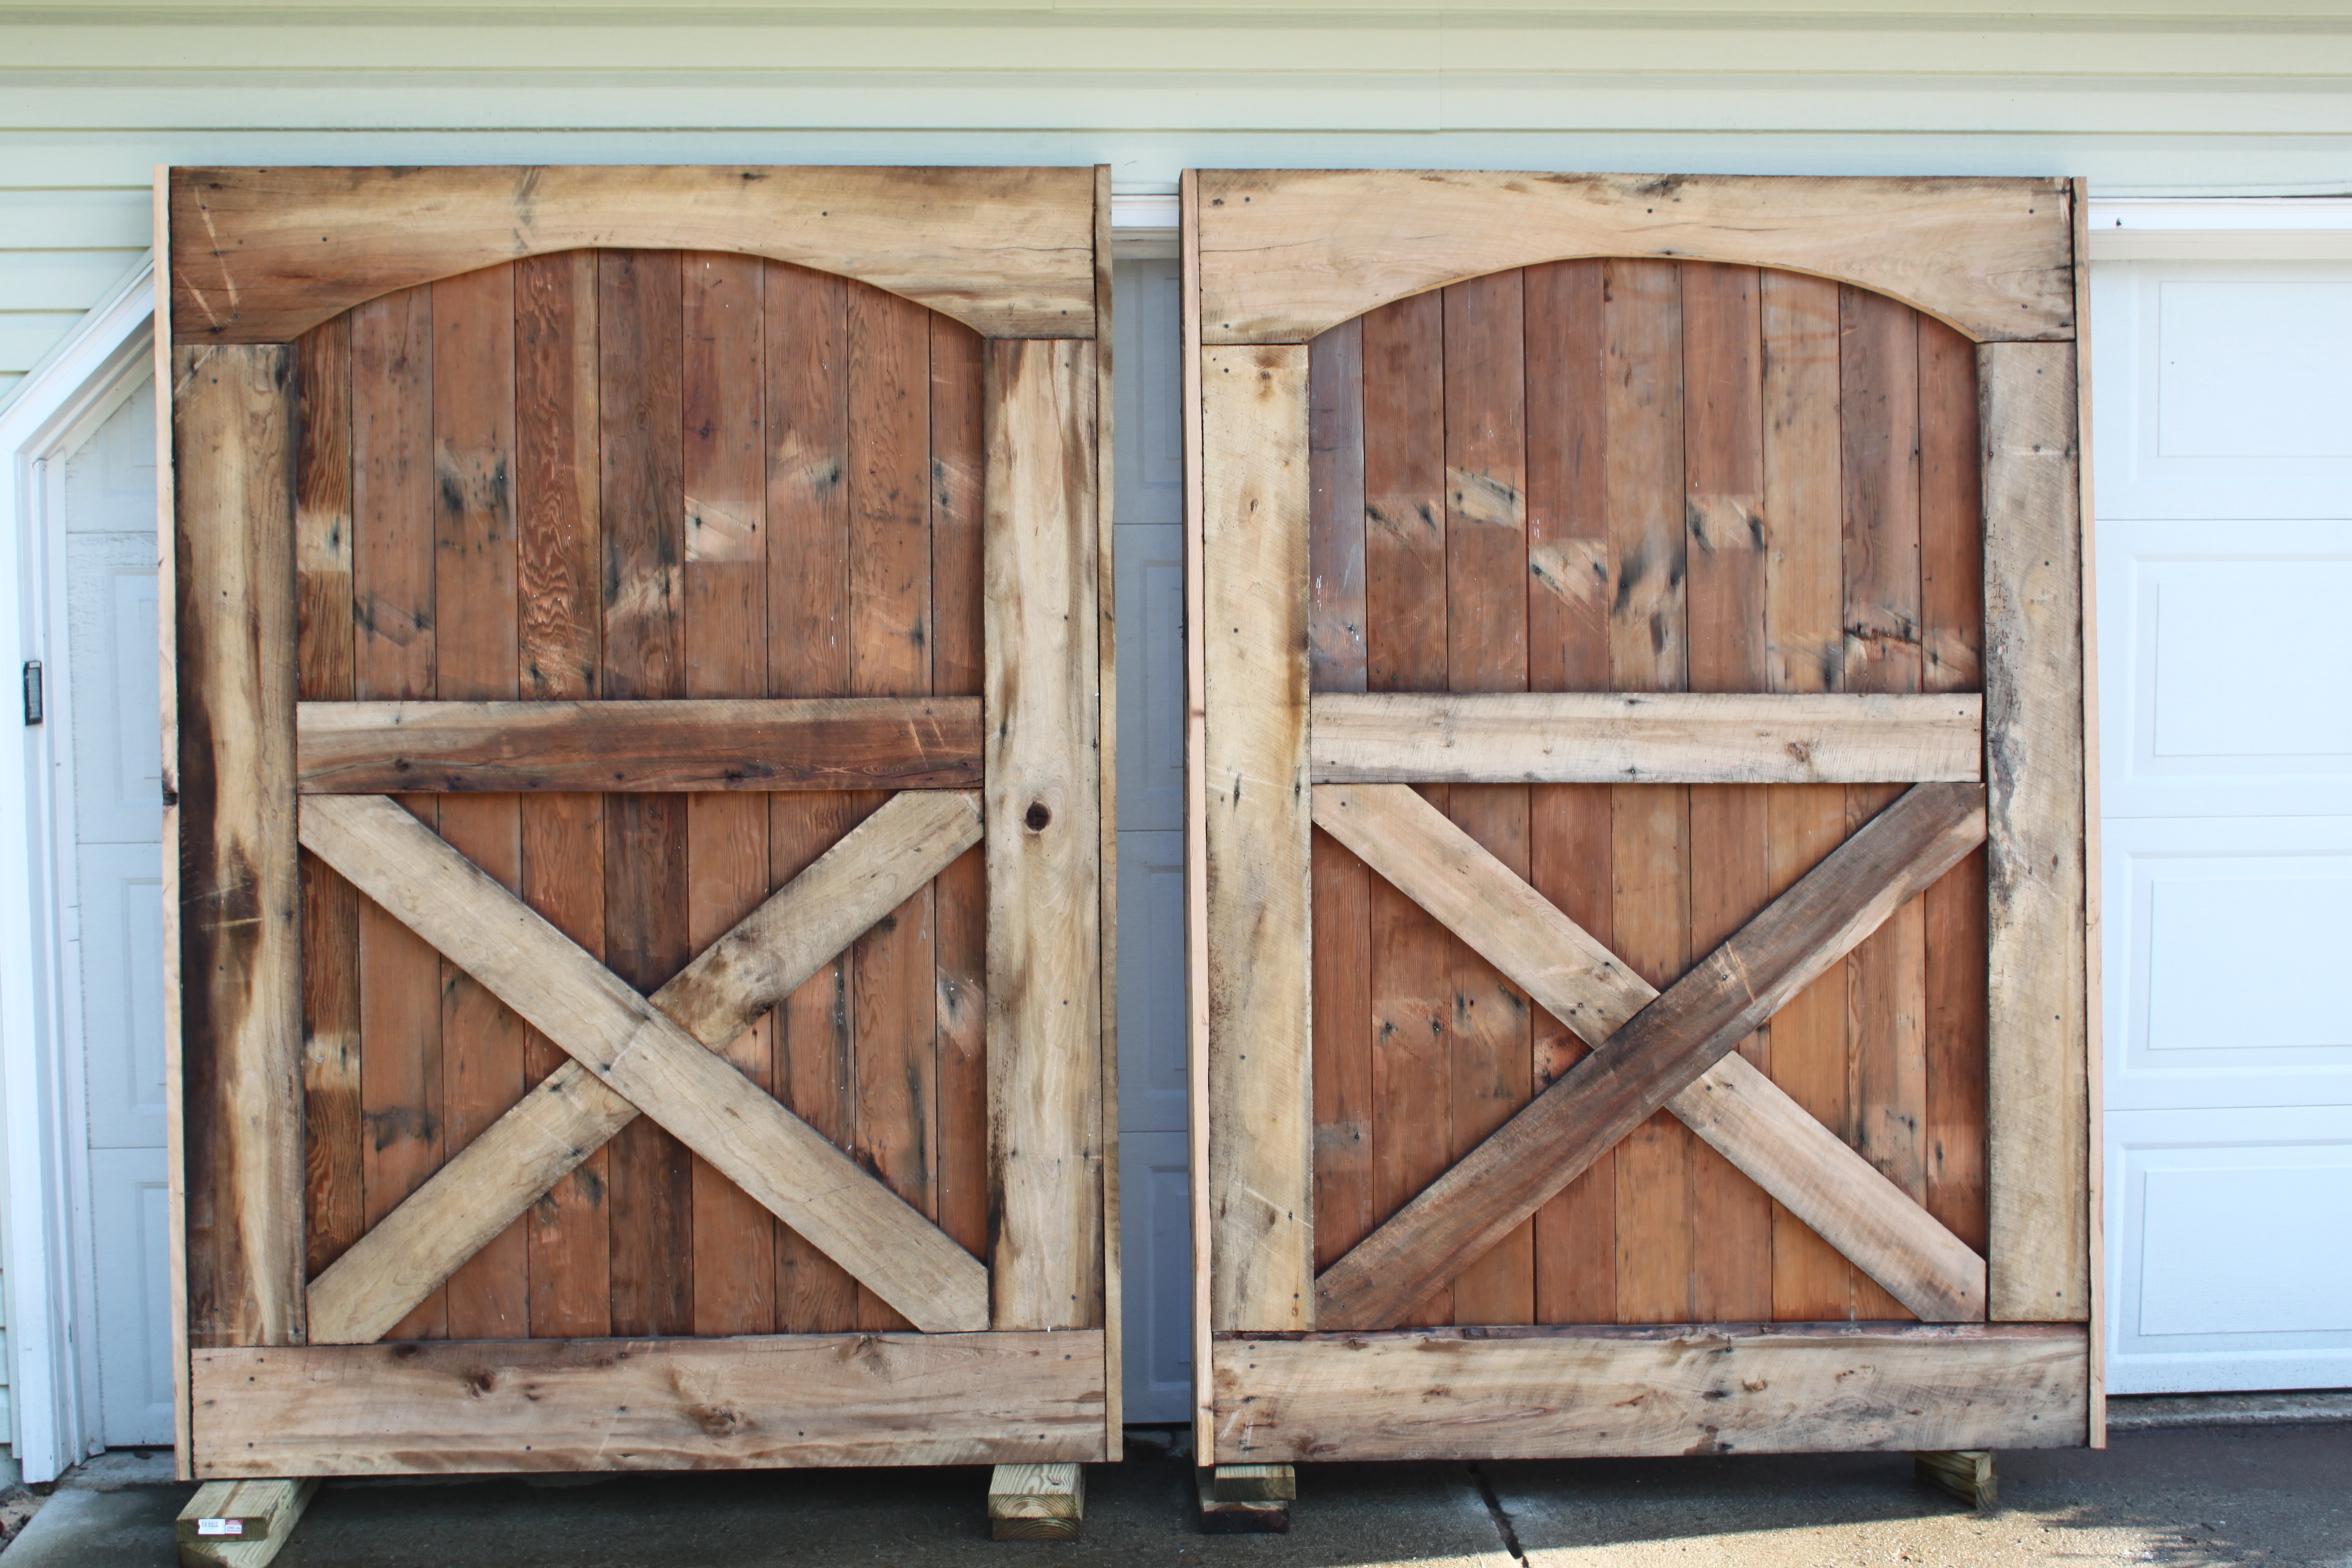 Barn Doors We Built From Old Barn Floorboards Jpg 2352 1568 With Images Barndoor Headboard Rustic Barn Door Making Barn Doors